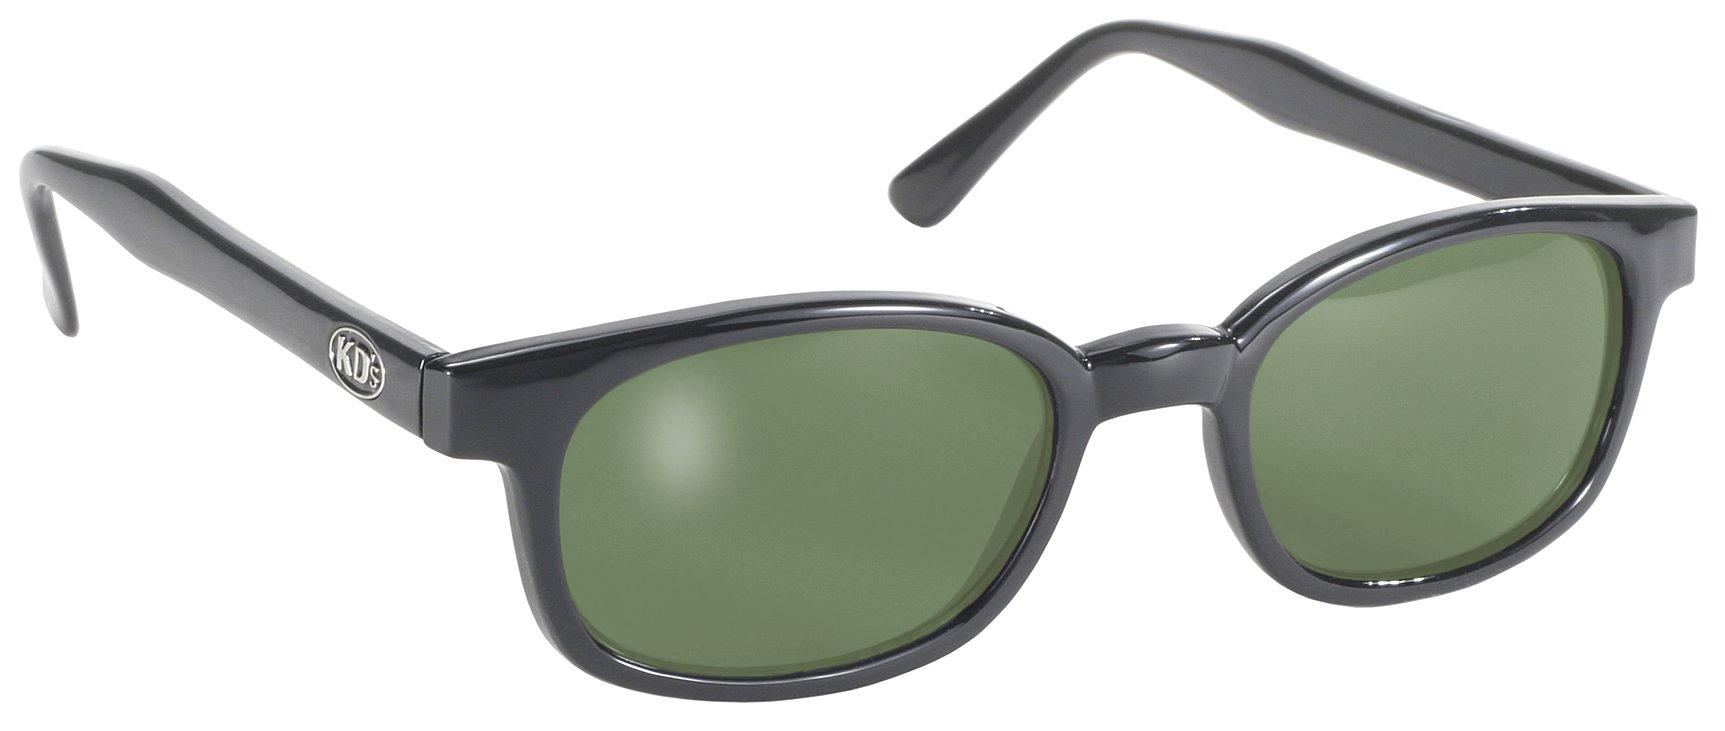 X KD Big Sunglasses Original Harley Biker Shades Black Green 1126